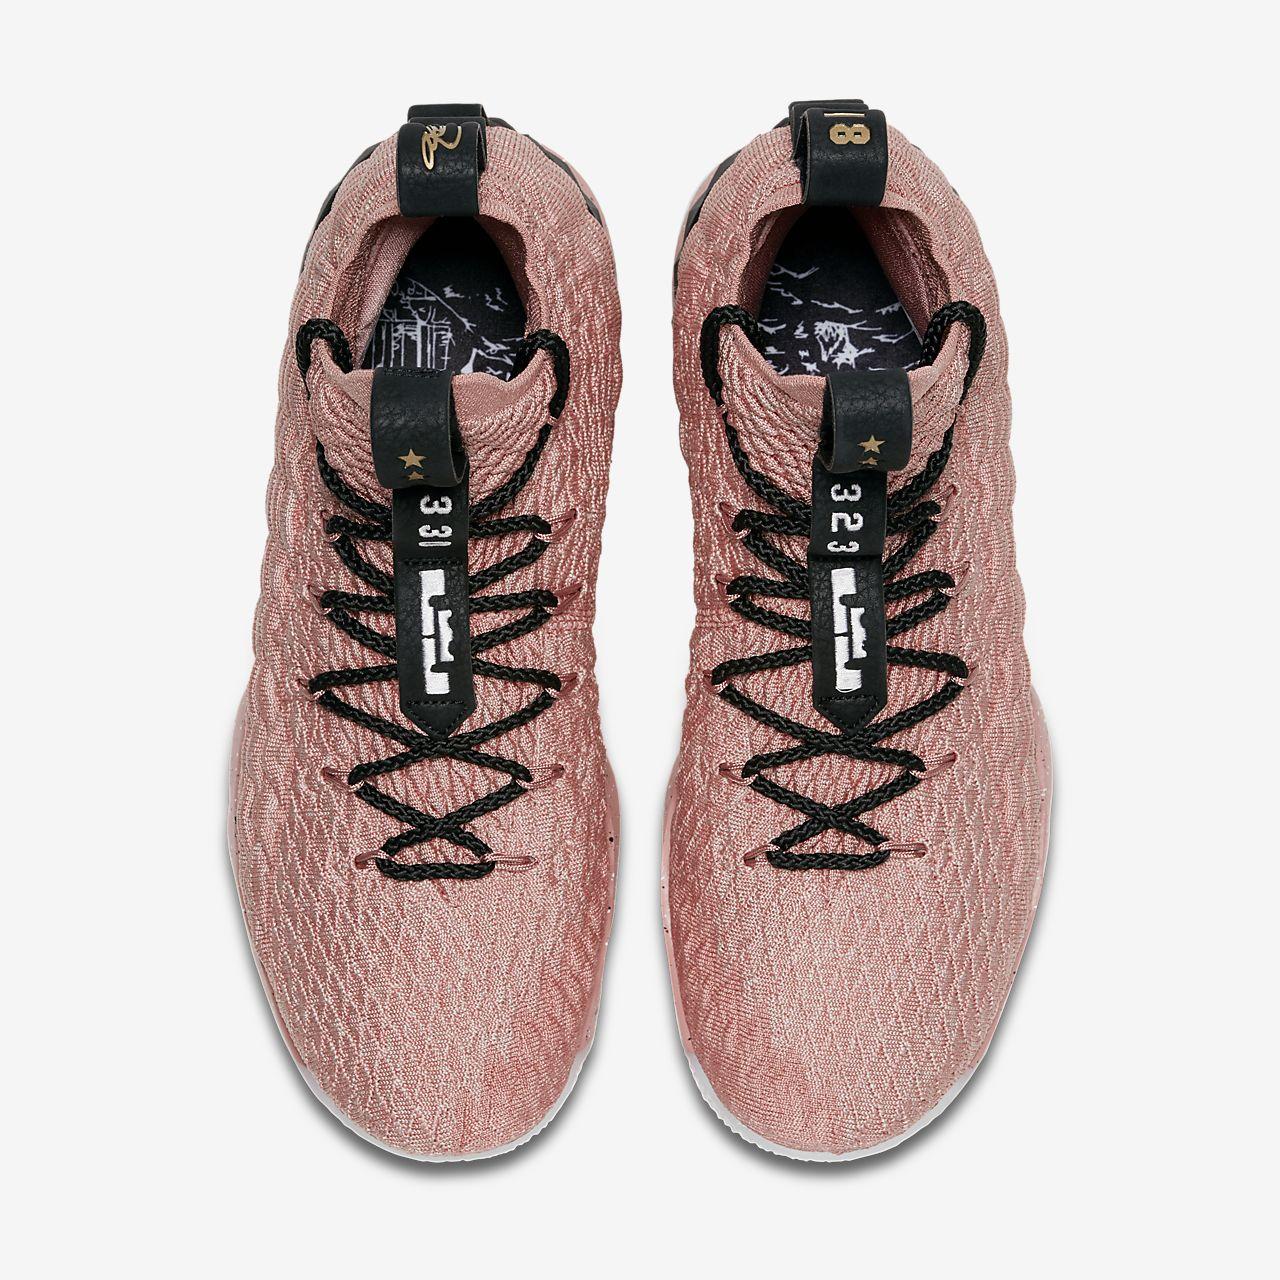 promo code d6037 41100 scarpe nike lebron 15 uomo